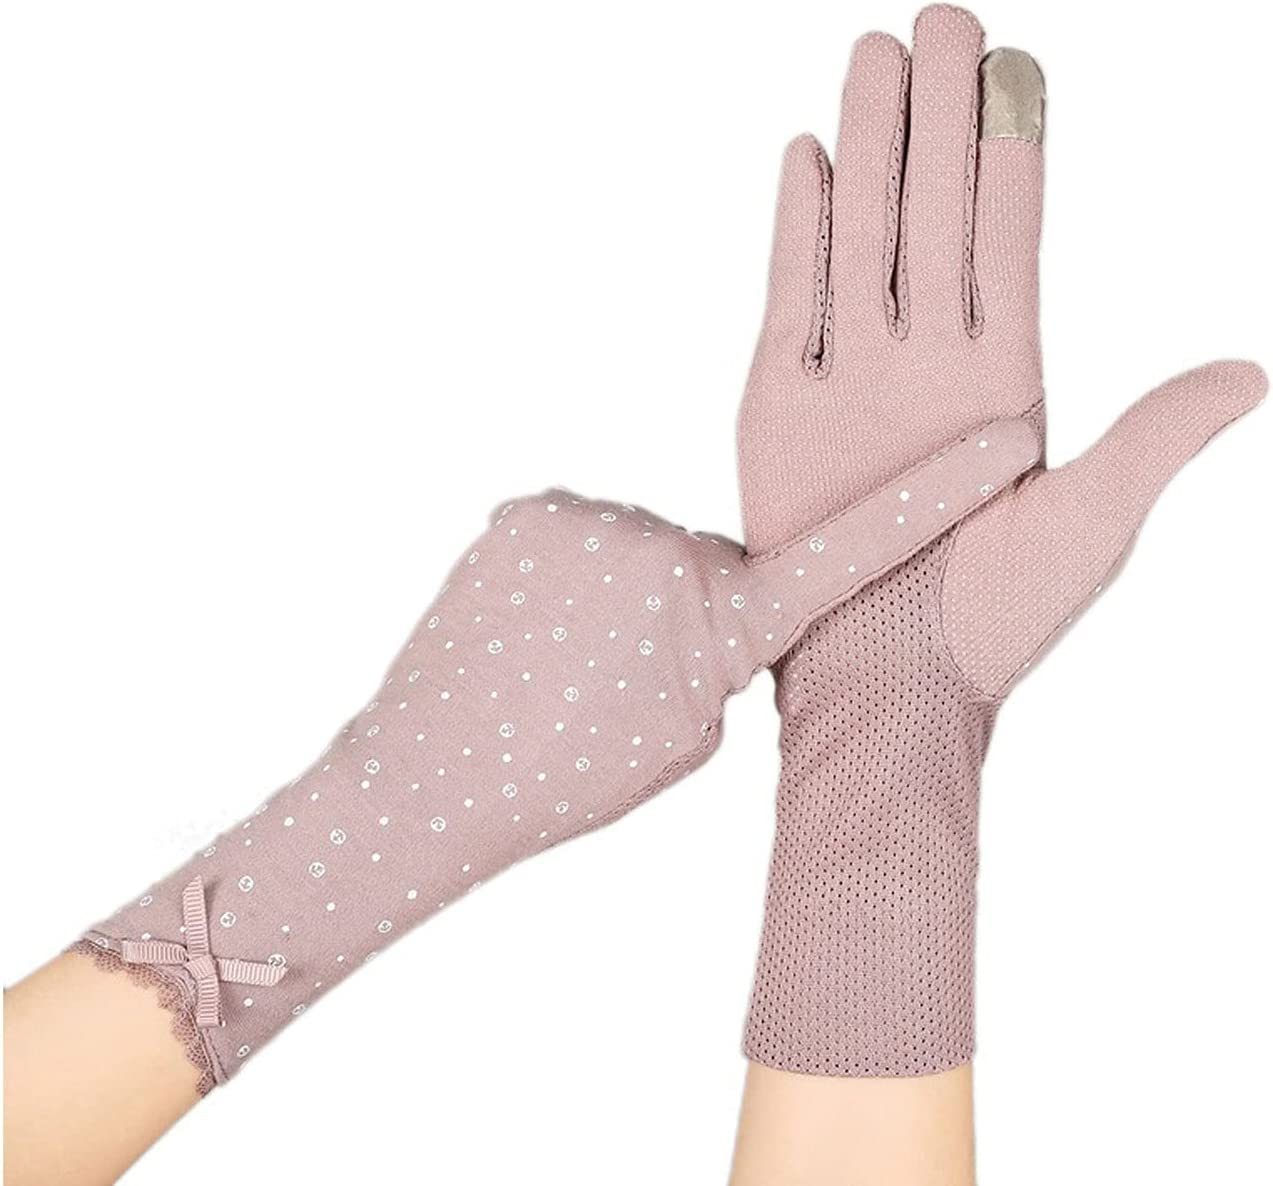 FEIMJLLK Fingerless Gloves for Women 2Pc Female Driver Mid-Long Summer Cotton Cycling Thin Touch Screen Car Driving Gloves Sunscreen Bike Sleeve Gloves for Women (Color : B)